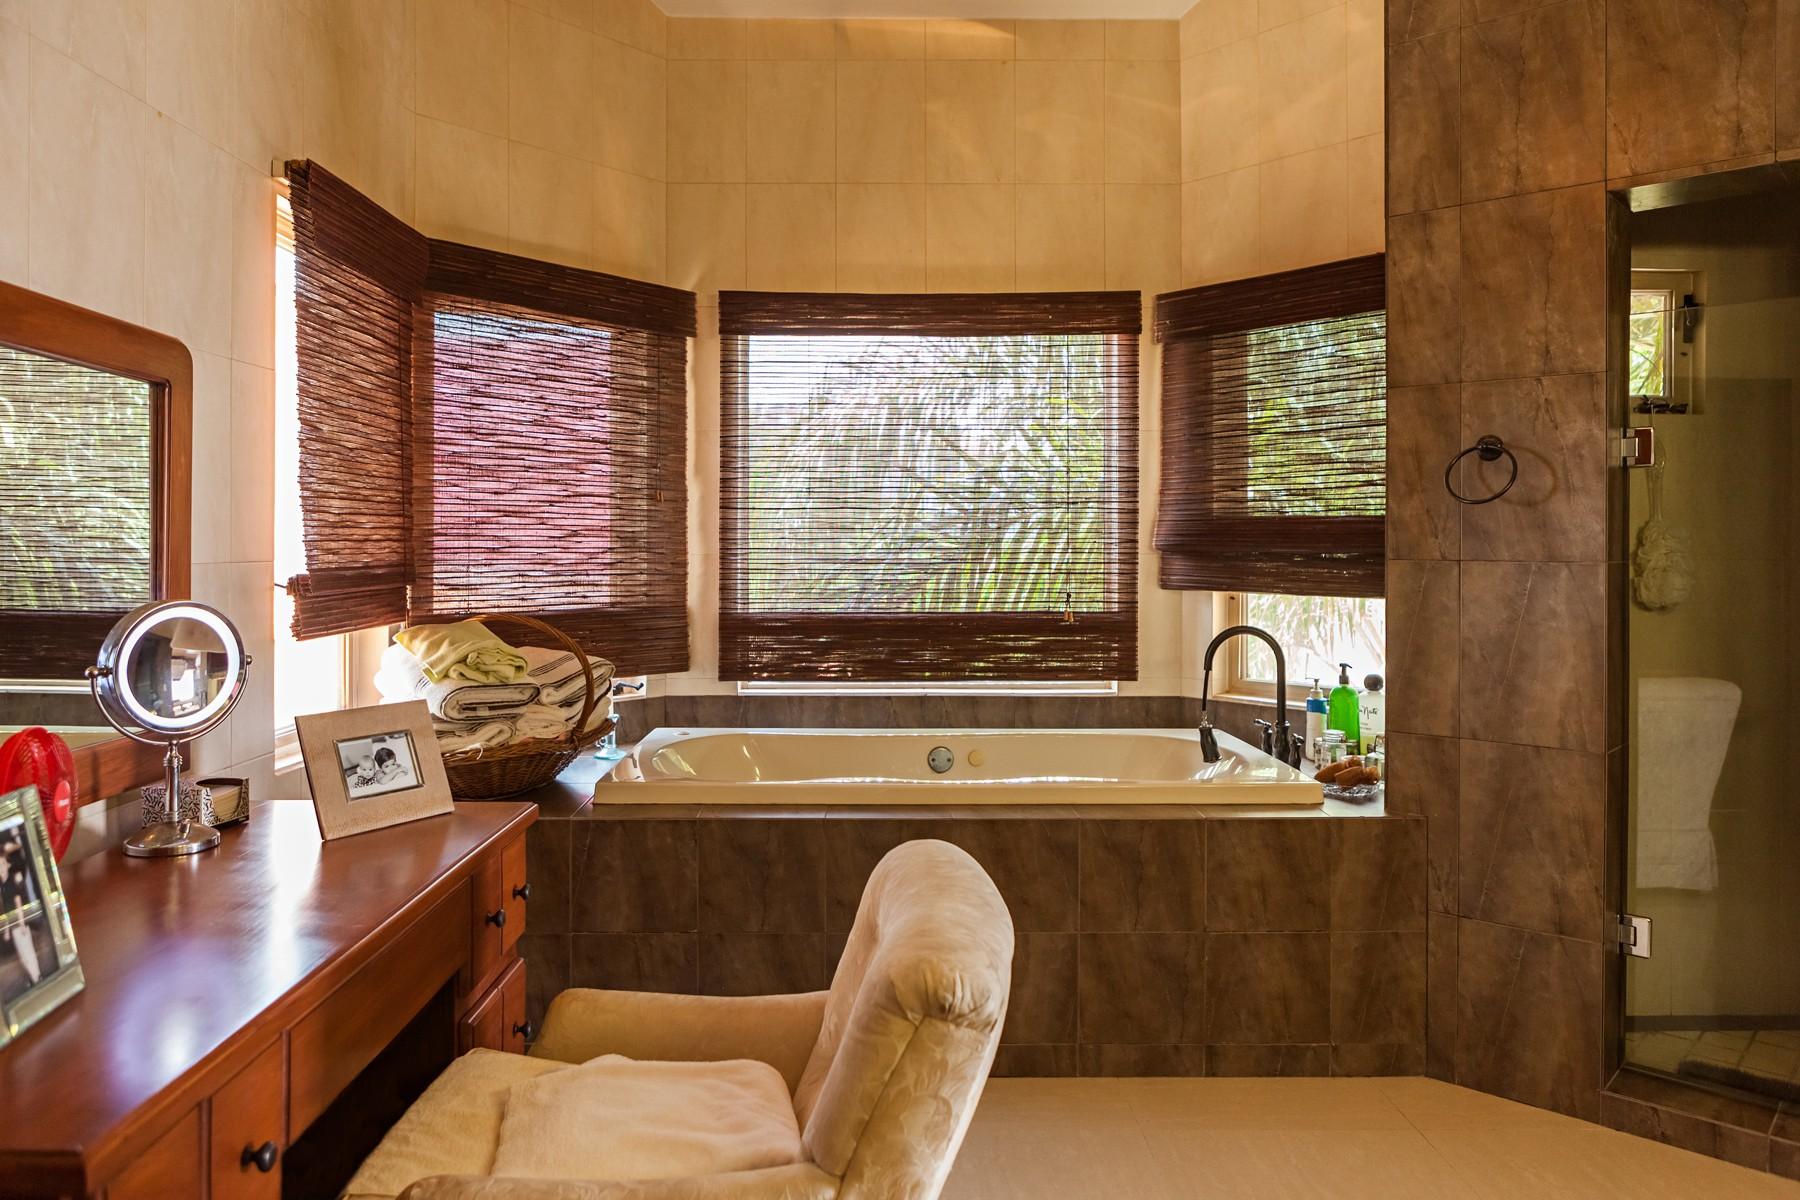 Additional photo for property listing at Casa Tranquila, Manzanillo Calle Almendros 100 Manzanillo, Colima 28860 México